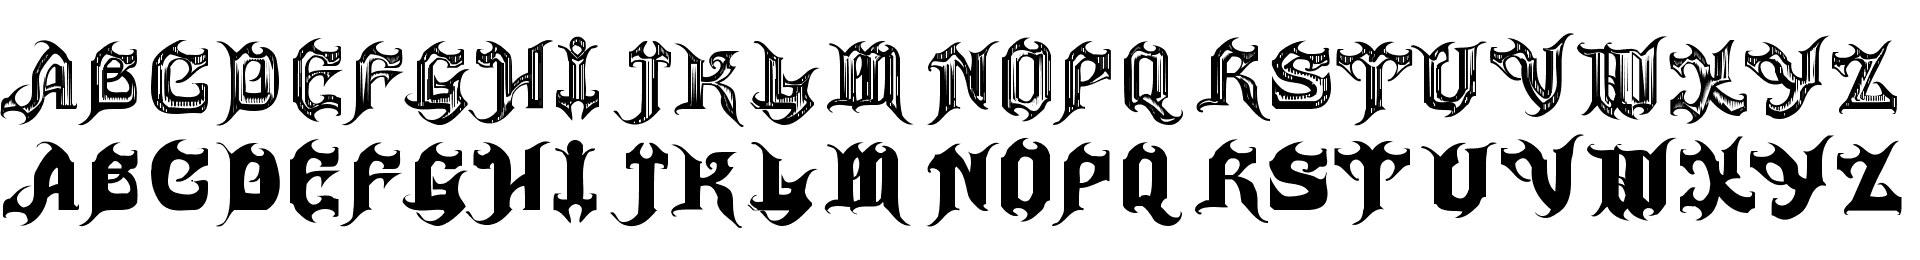 Haunted-Normal